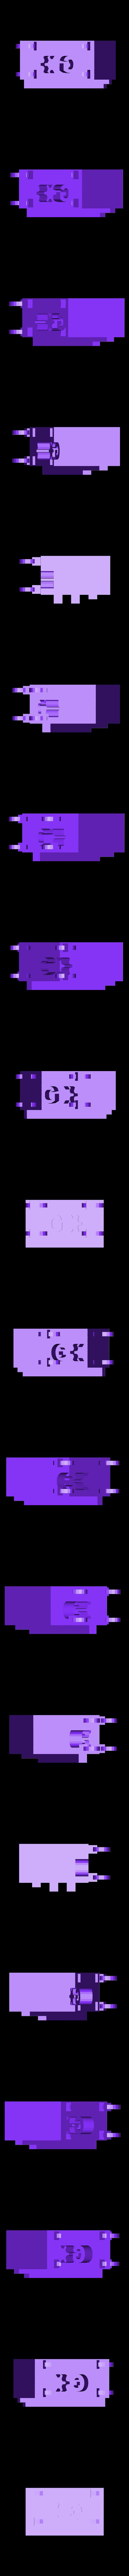 Servante d'atelier.stl Download free STL file Shop assistant • 3D printable design, Garage143